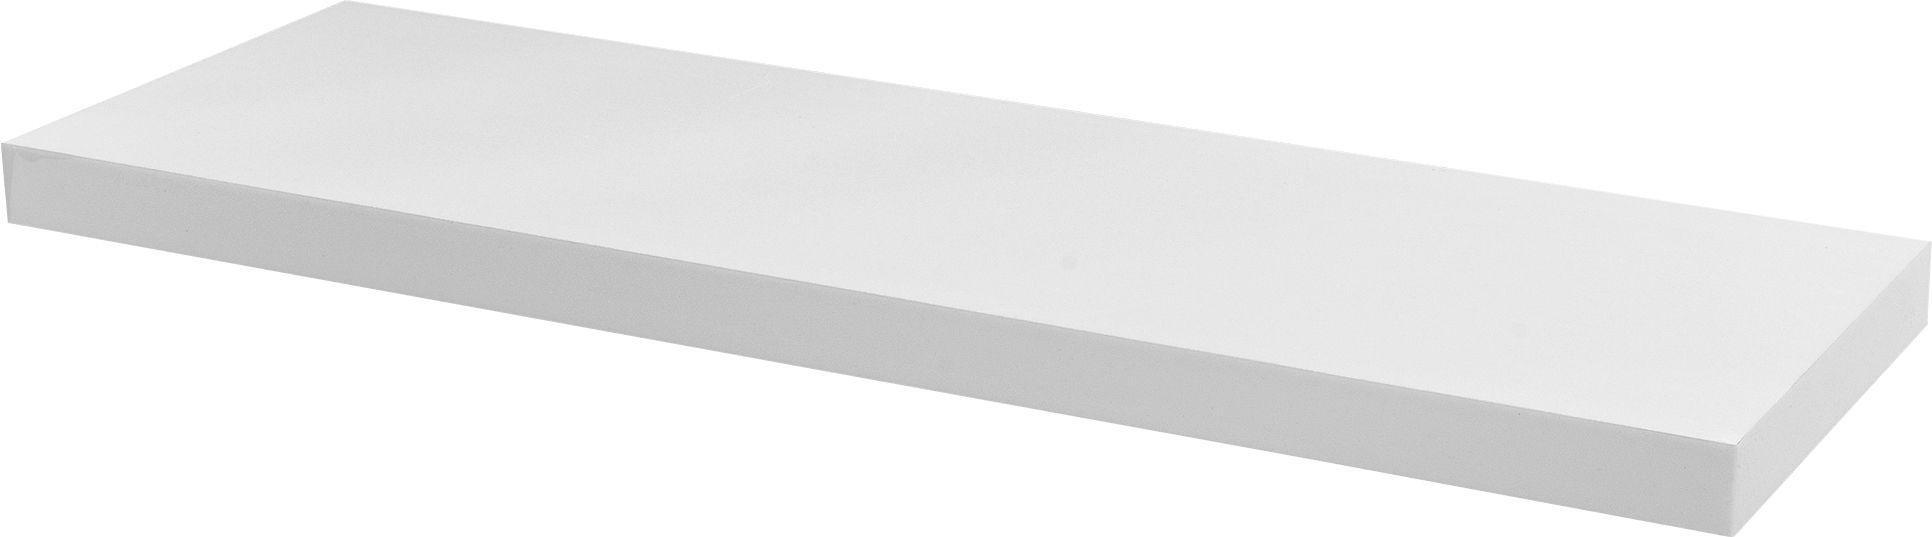 Argos Home Glenmore 80cm Floating Shelf - High White Gloss